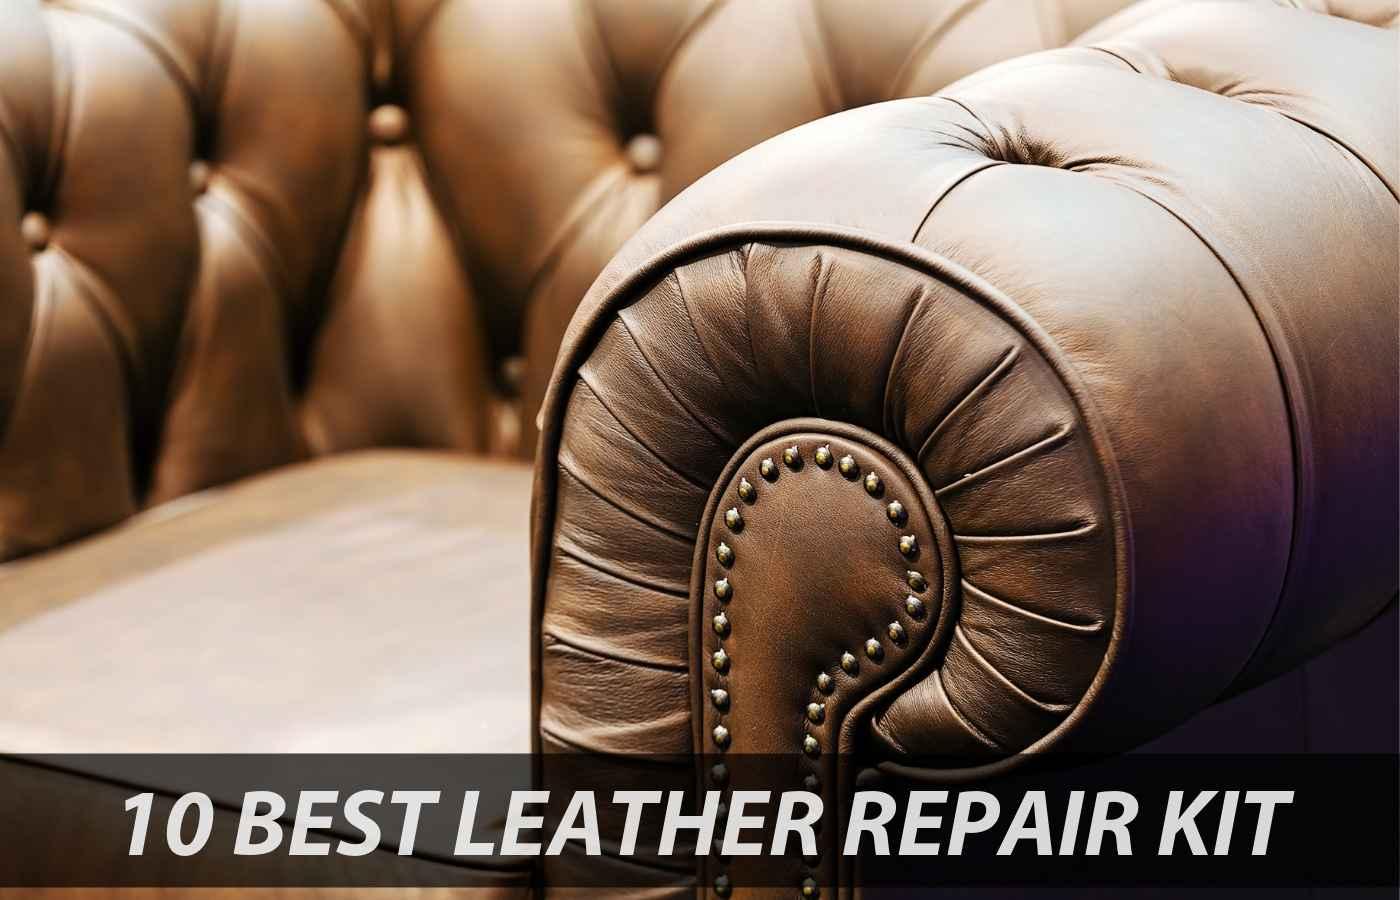 10 Best Leather Repair Kits (September 2019) - ReviewBites